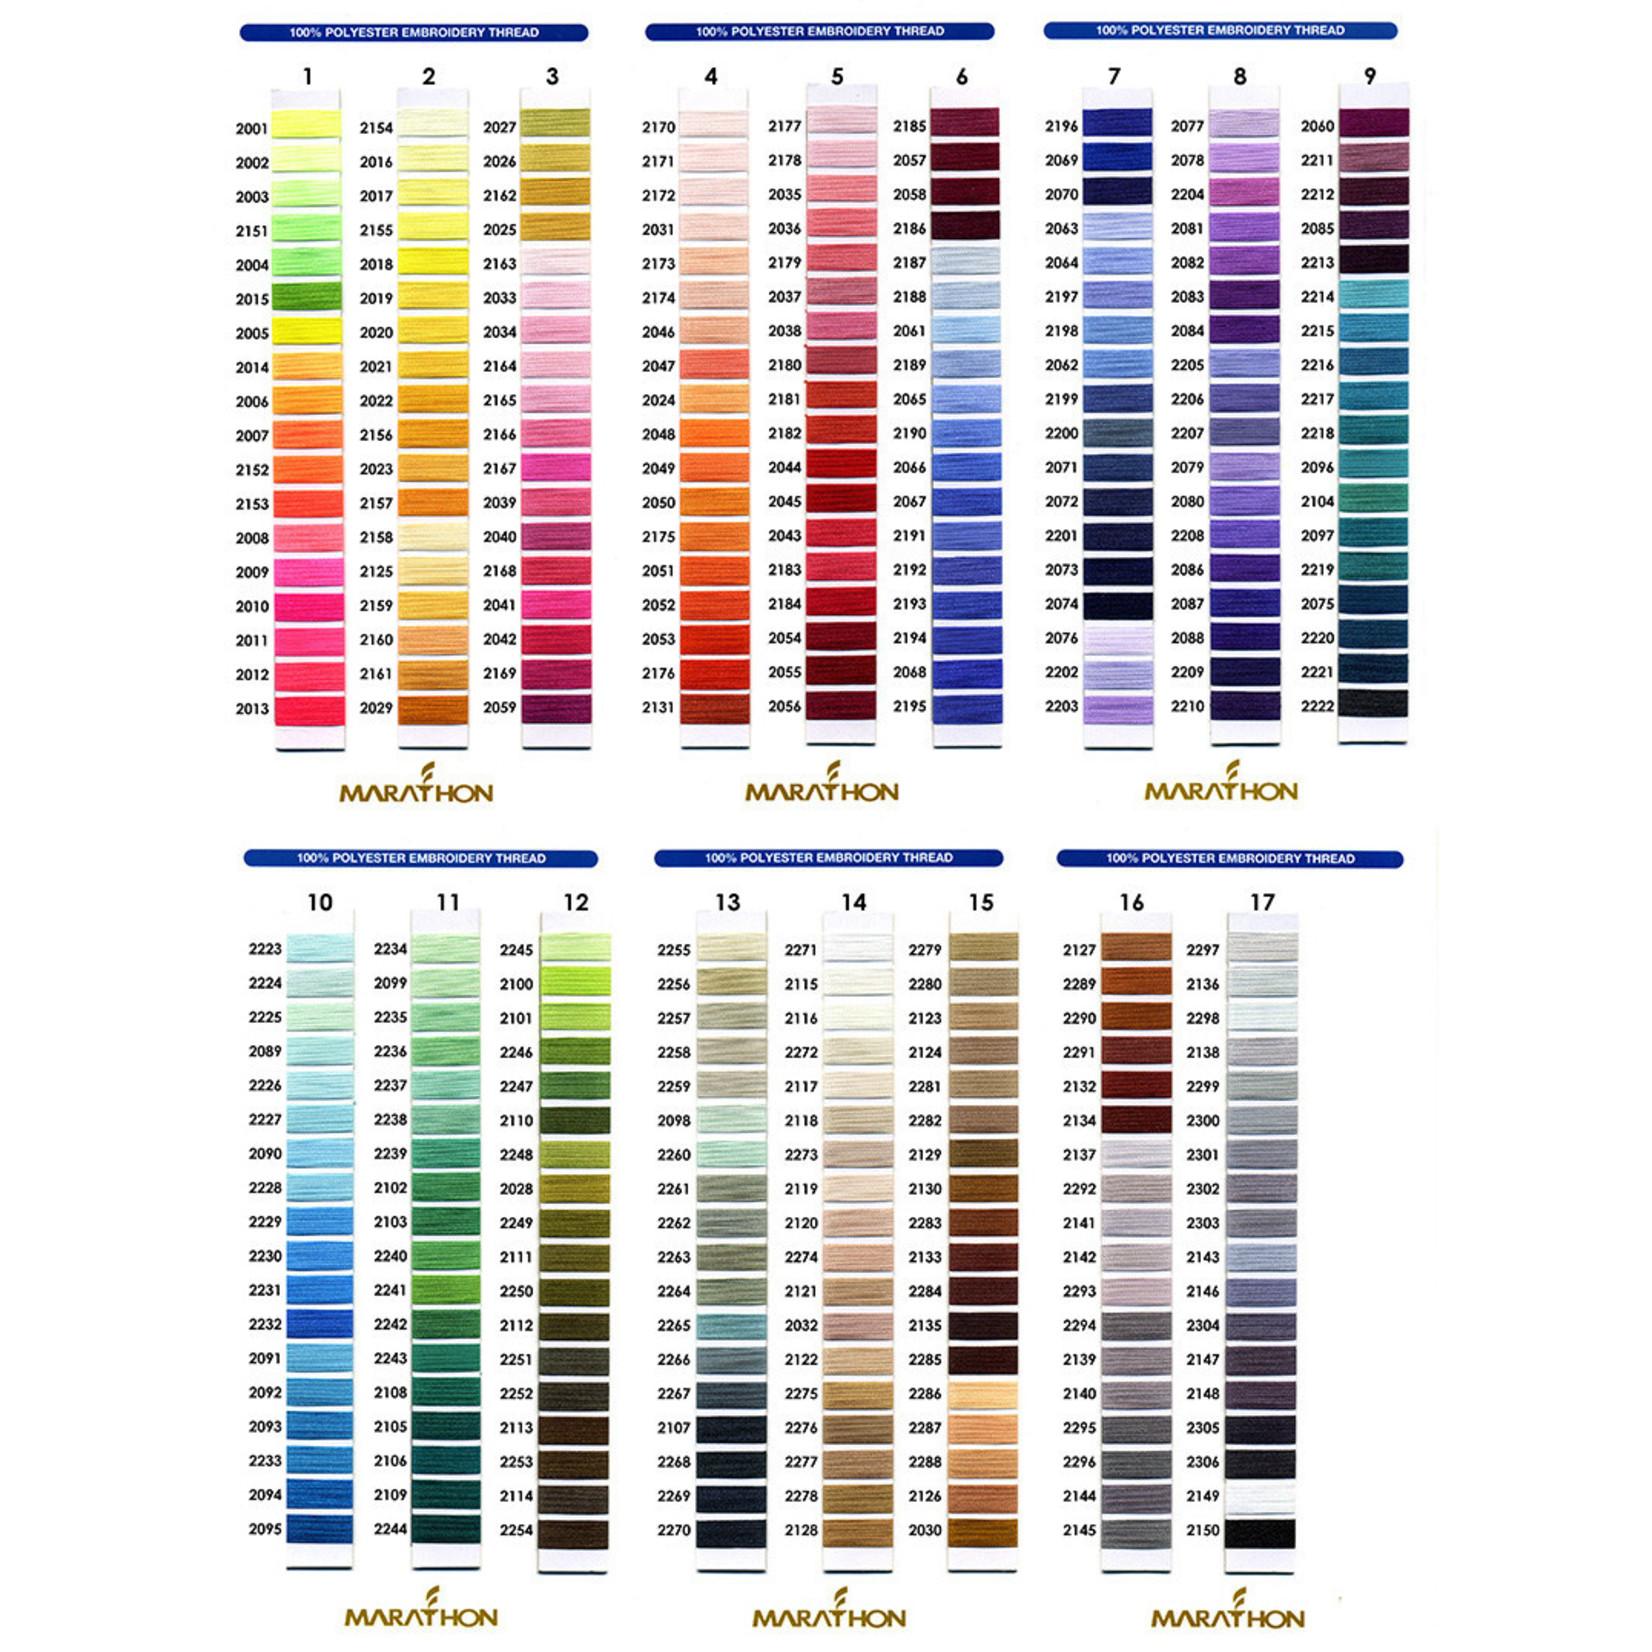 MARATHON Colour 2037 - 5000mtr POLY EMBROIDERY THREAD